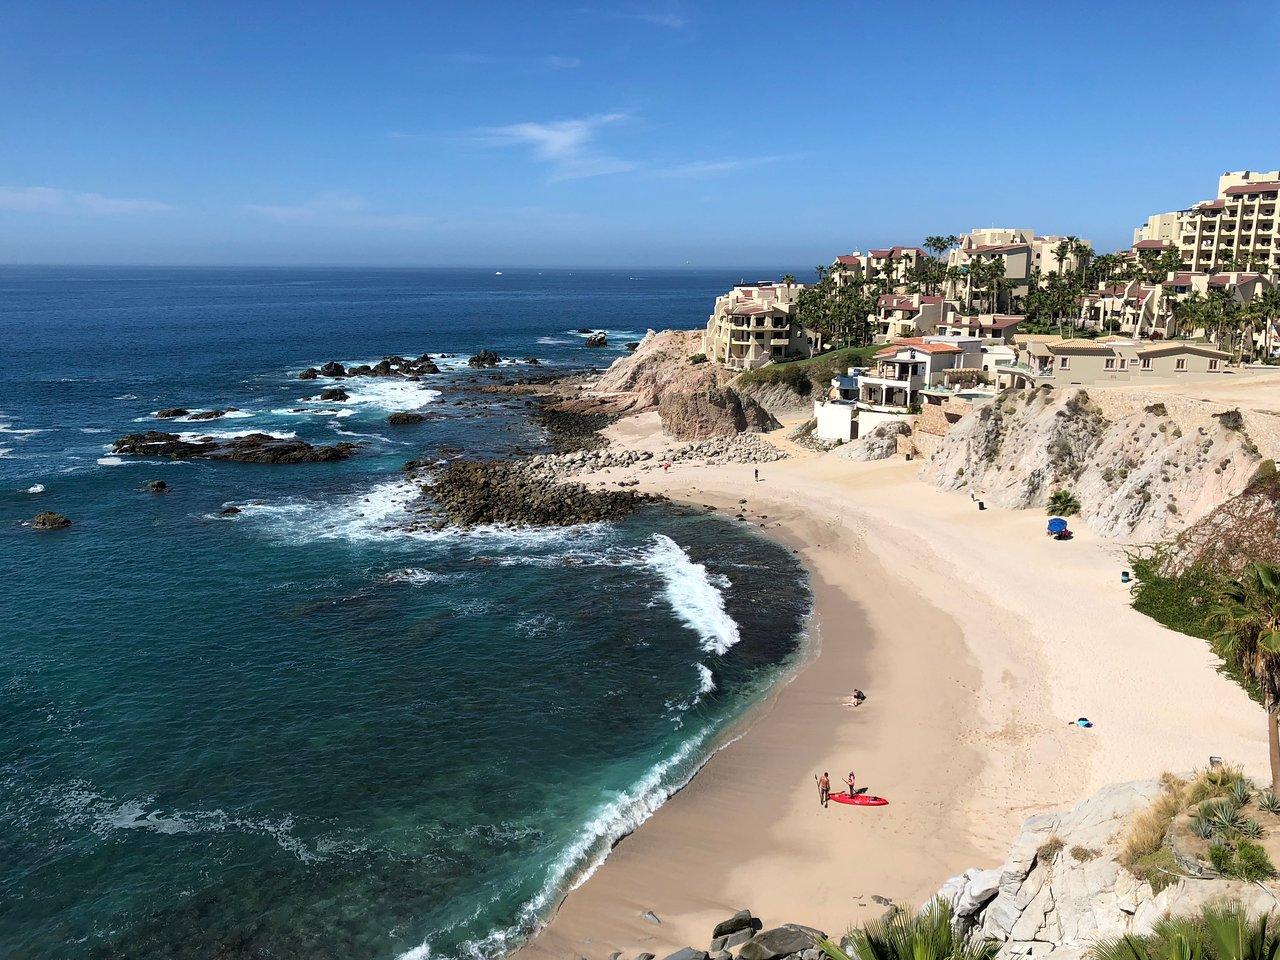 Welk_Resorts_Cabo_San_Lucas_Sirena_del_Mar_Beach_View_109cc95886.jpg